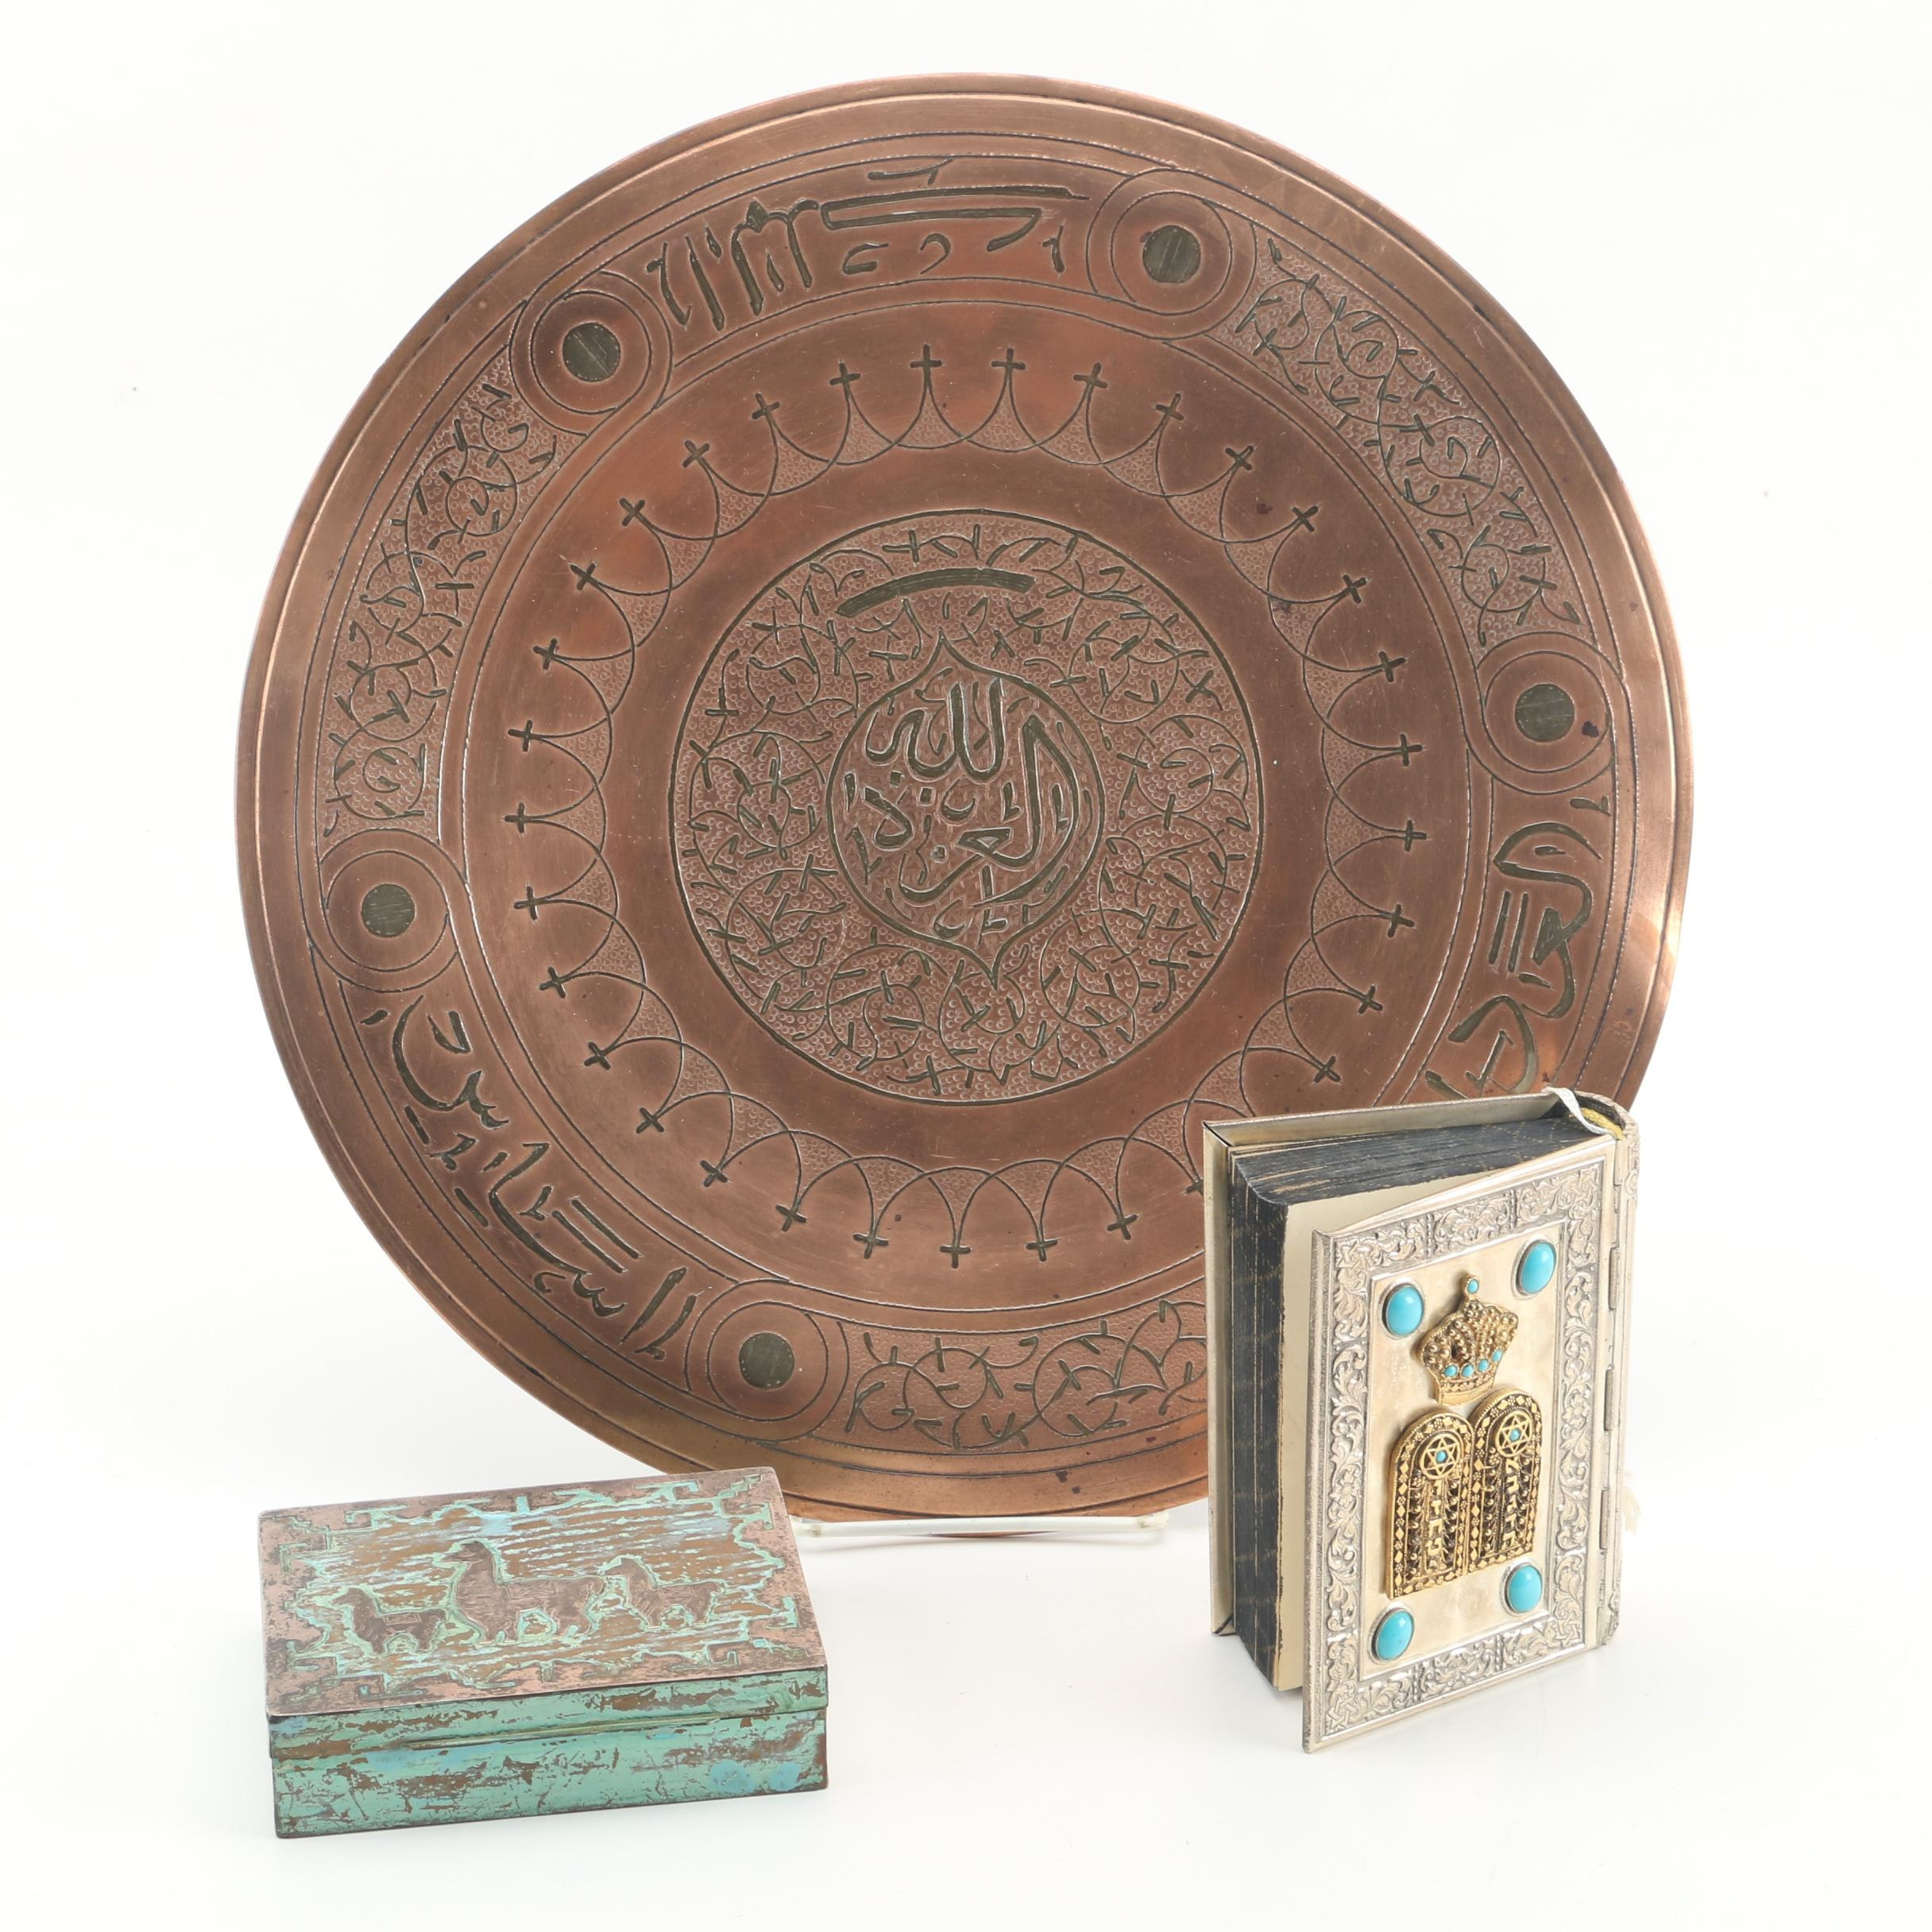 Vintage Siddur Avodat Israel Jewish Prayer Book, Hanging Metal Plate and Box